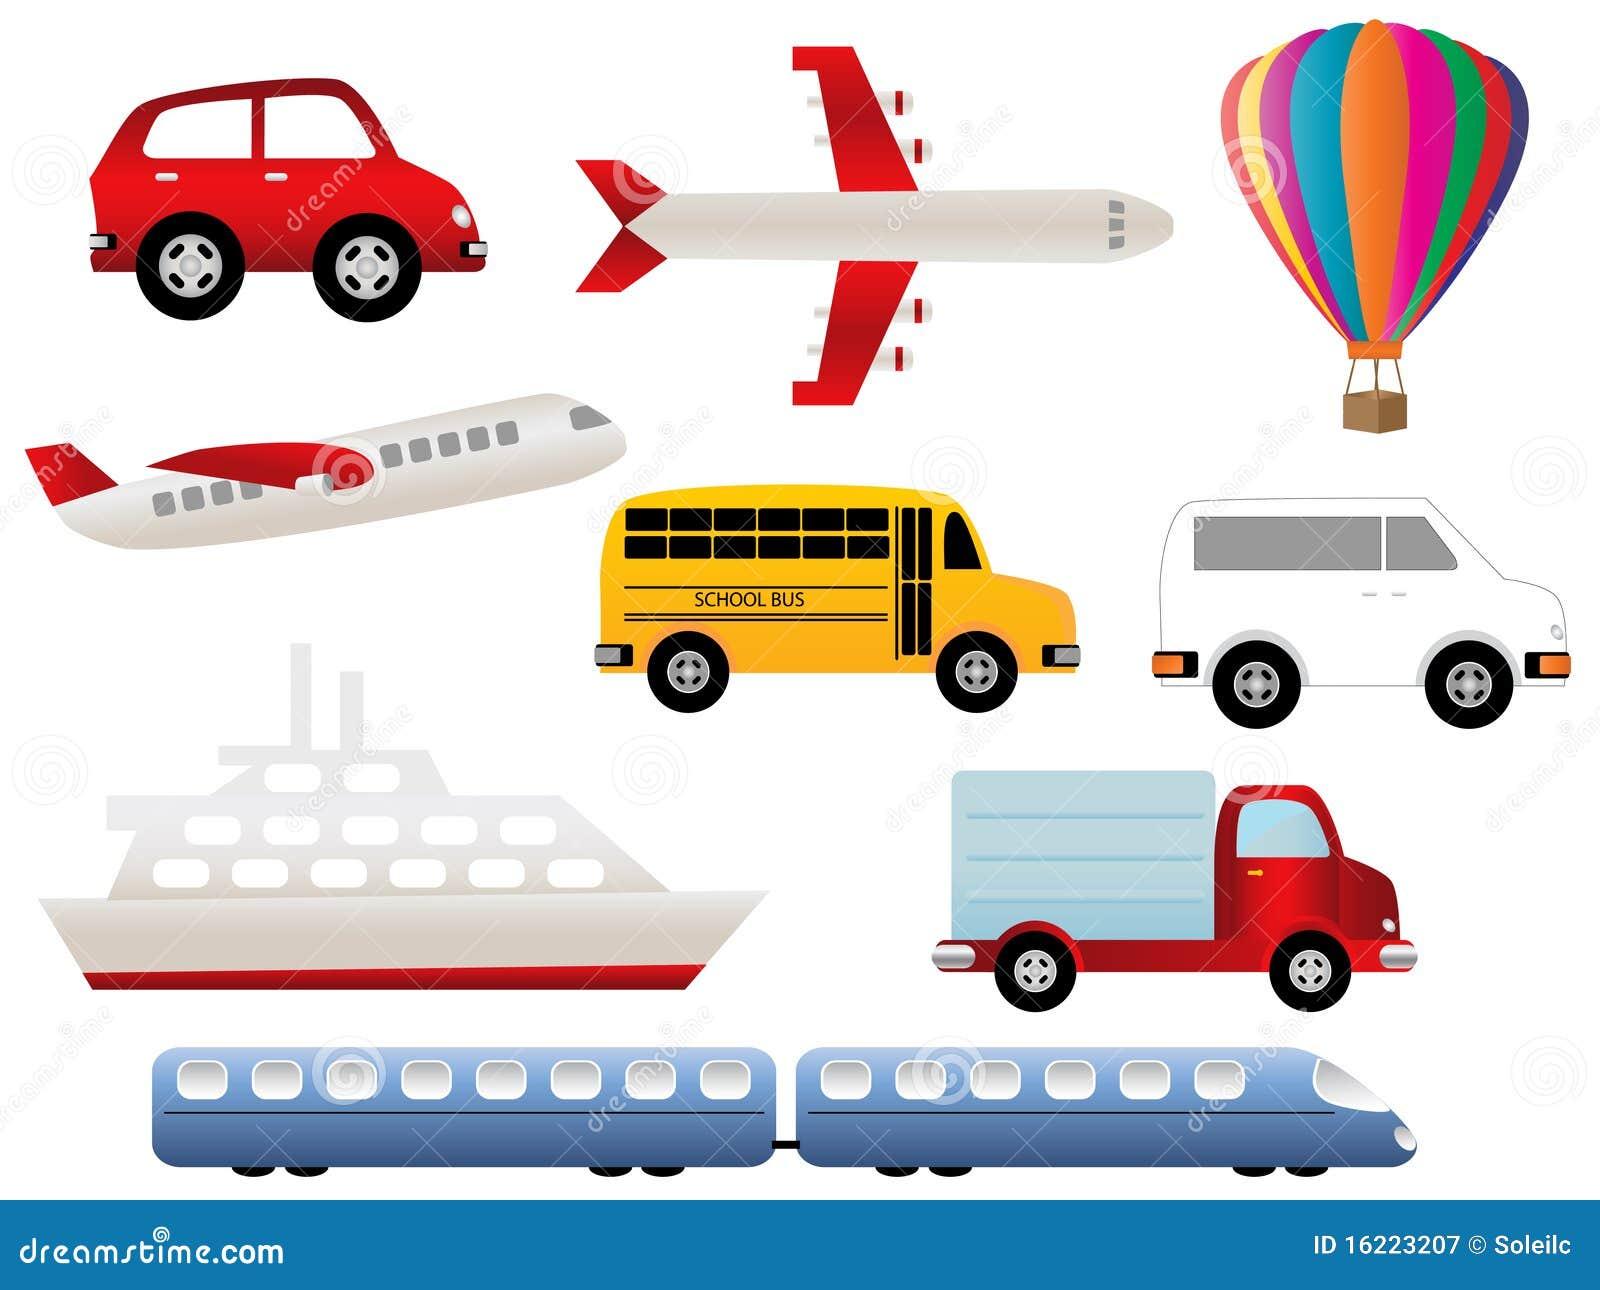 Transportation Symbols Royalty Free Stock Photography